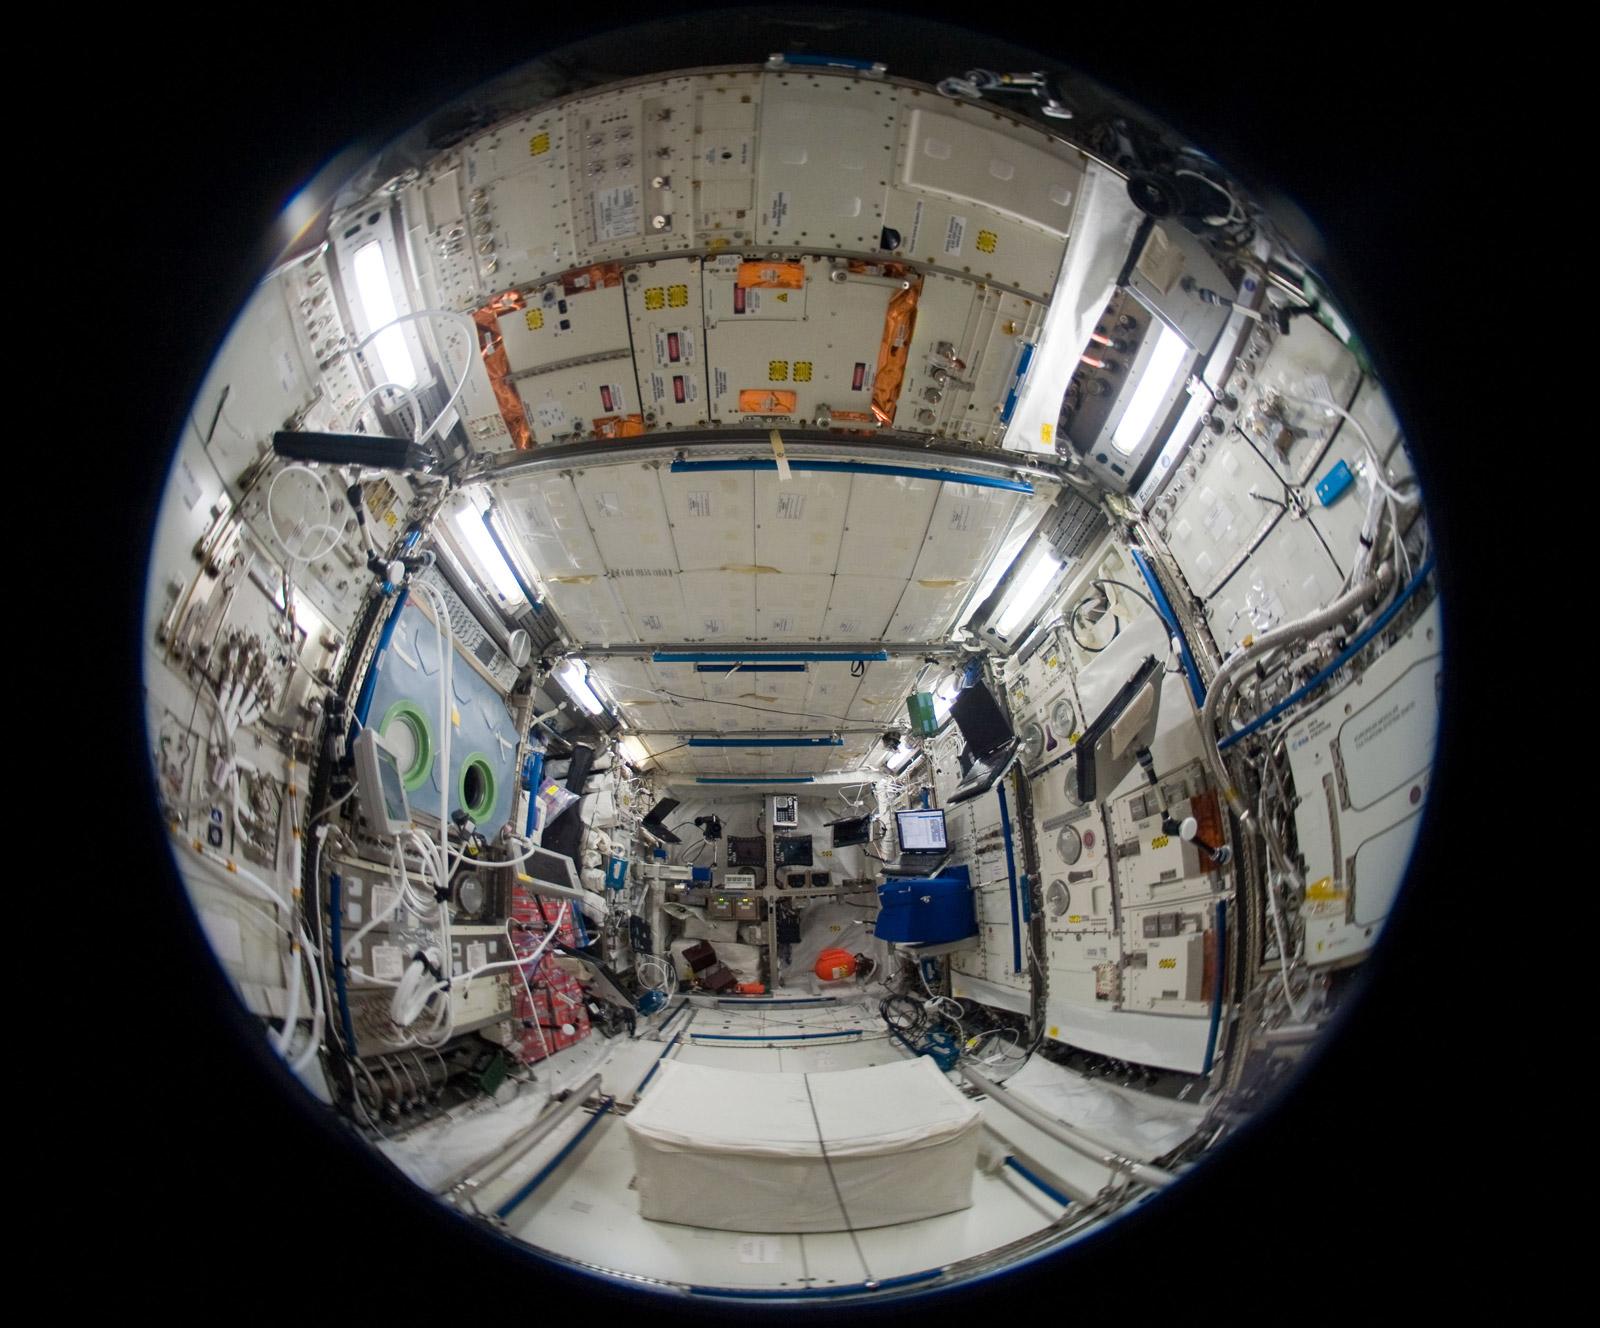 Stupéfiant: STS088 Photos nasa - Page 5 Columbus_station_nasa_esa